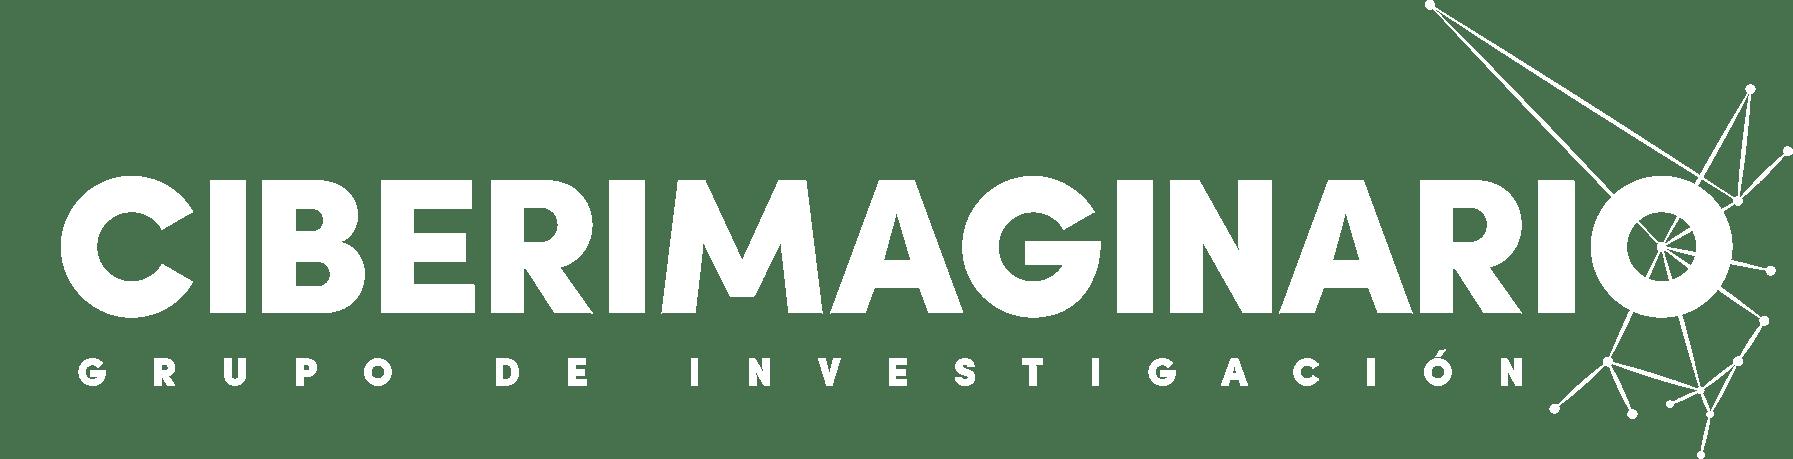 Comunicación Científica Eficiente Grupo de investigación Ciberimaginario